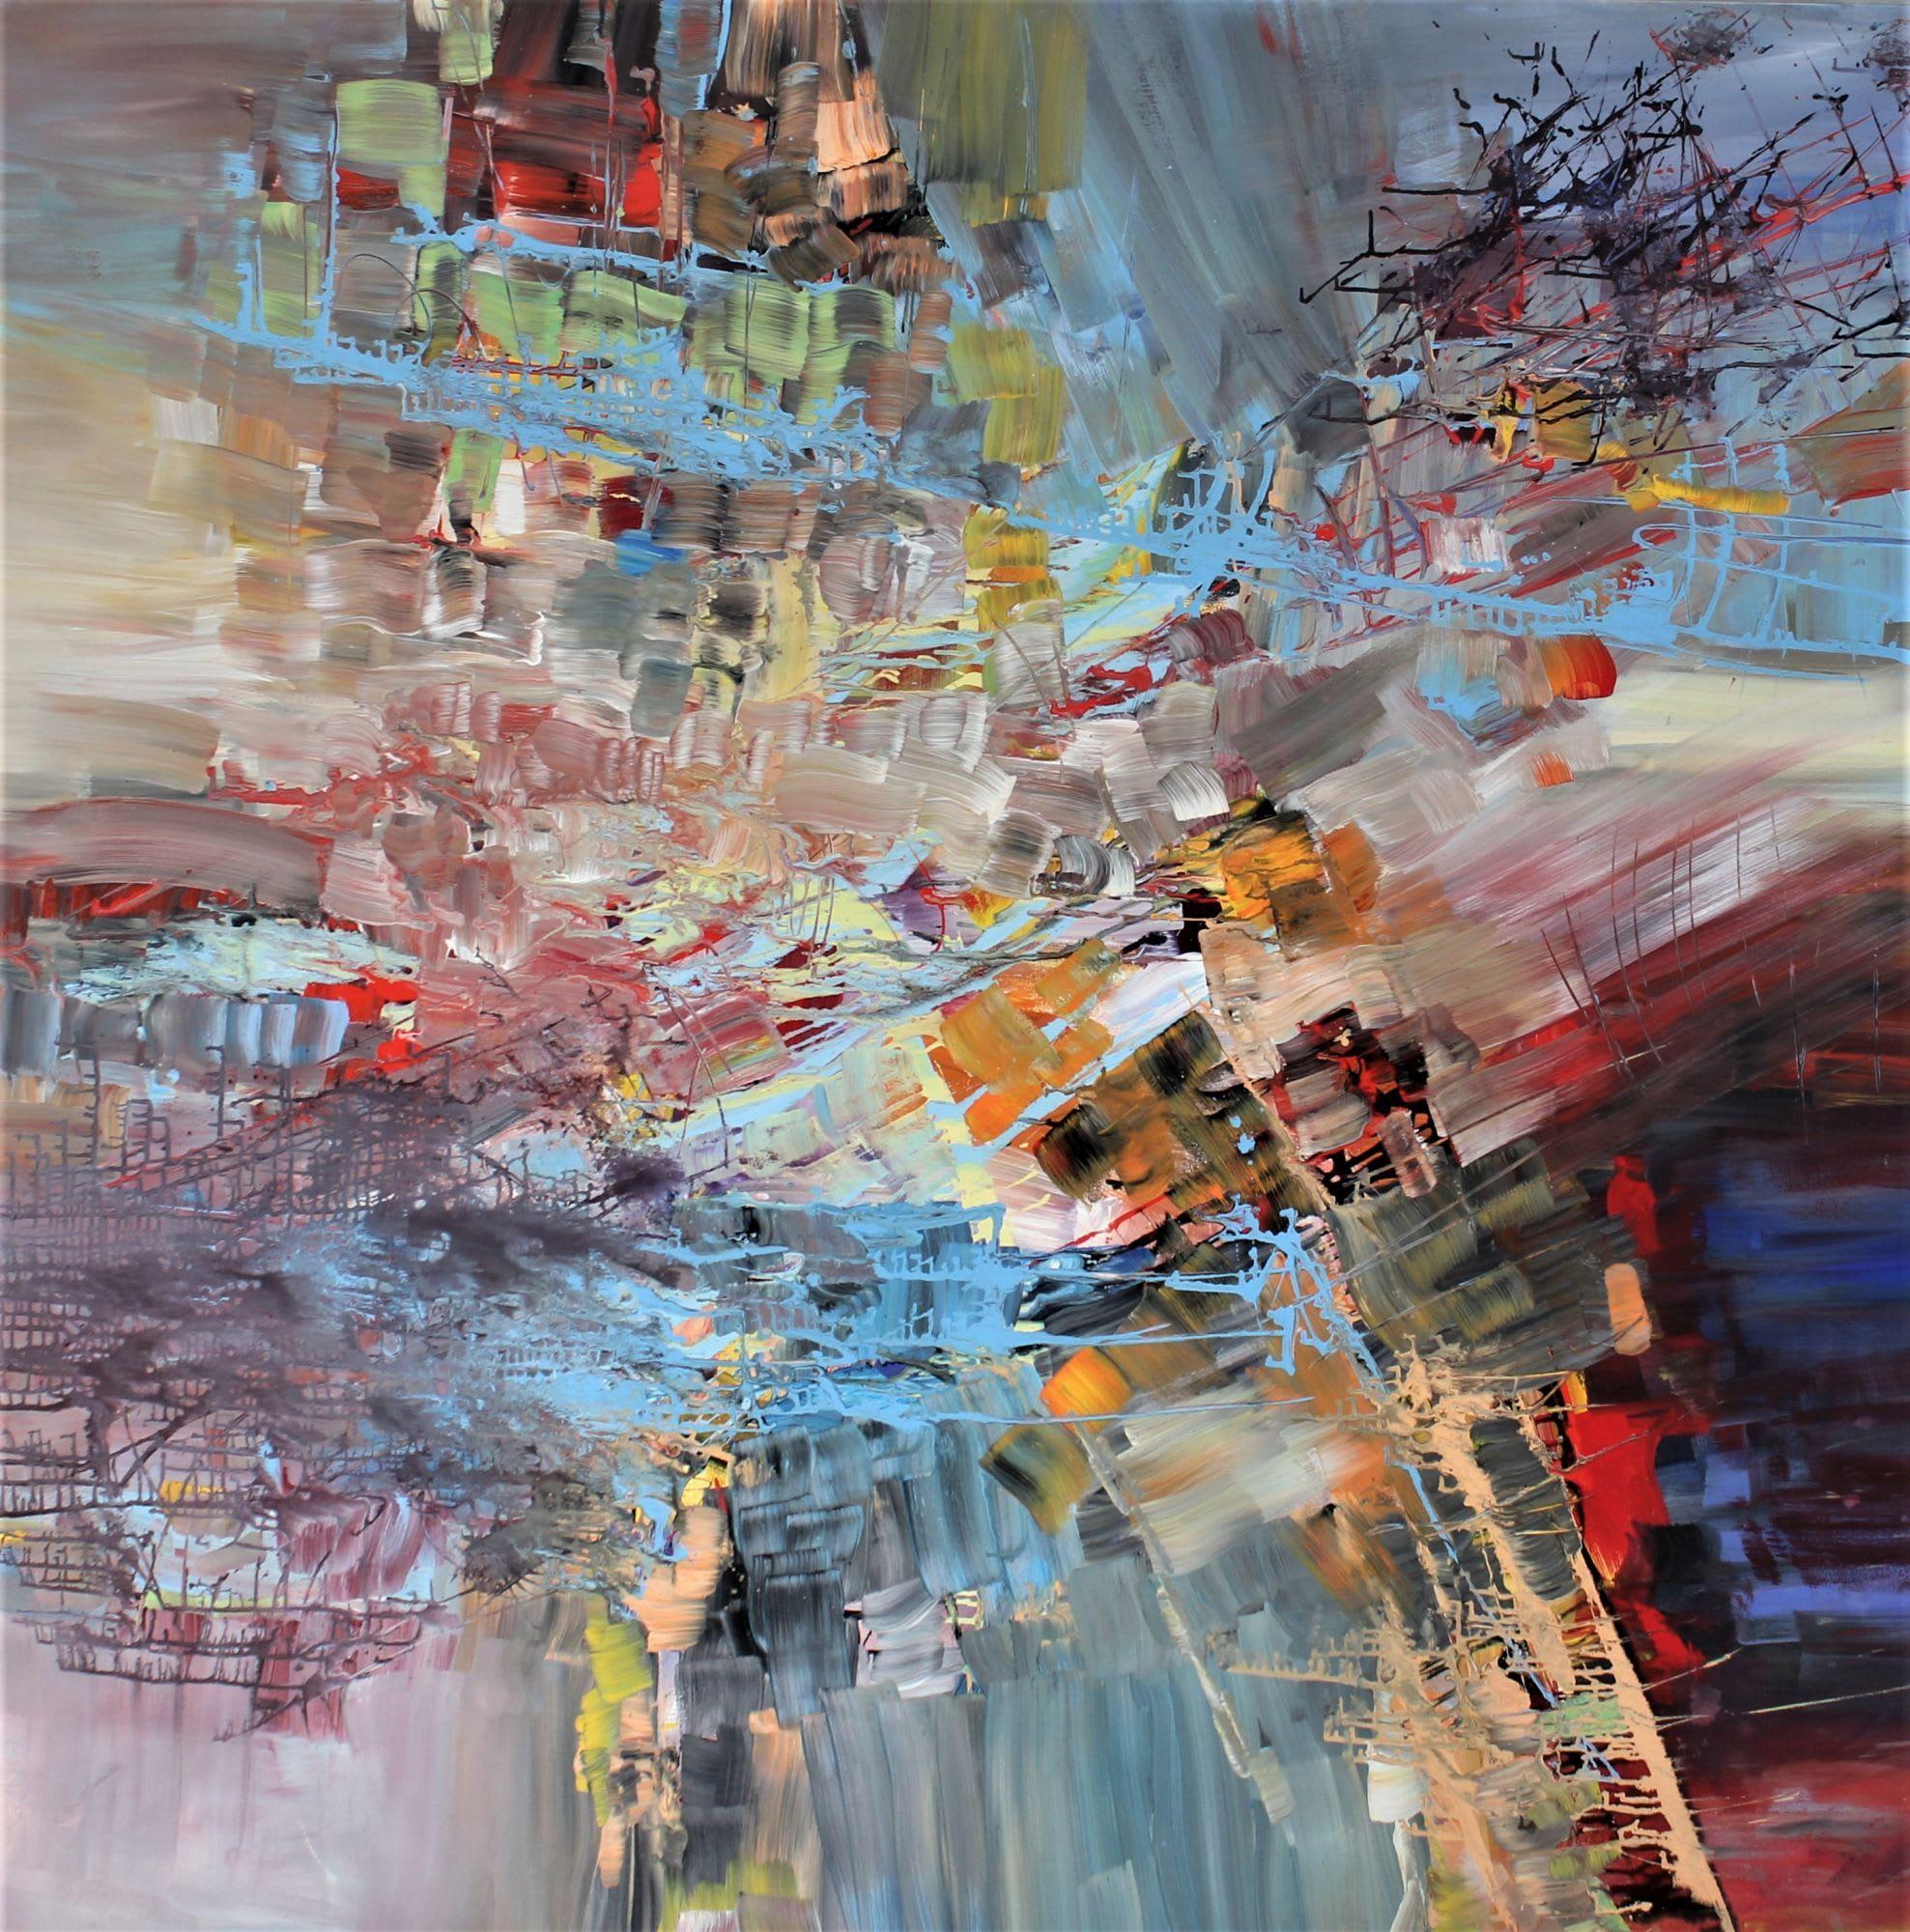 'A Bruckner, Mass no. 3, Die Grosse Messe' by Ernestine Tahedl at Gallery 133